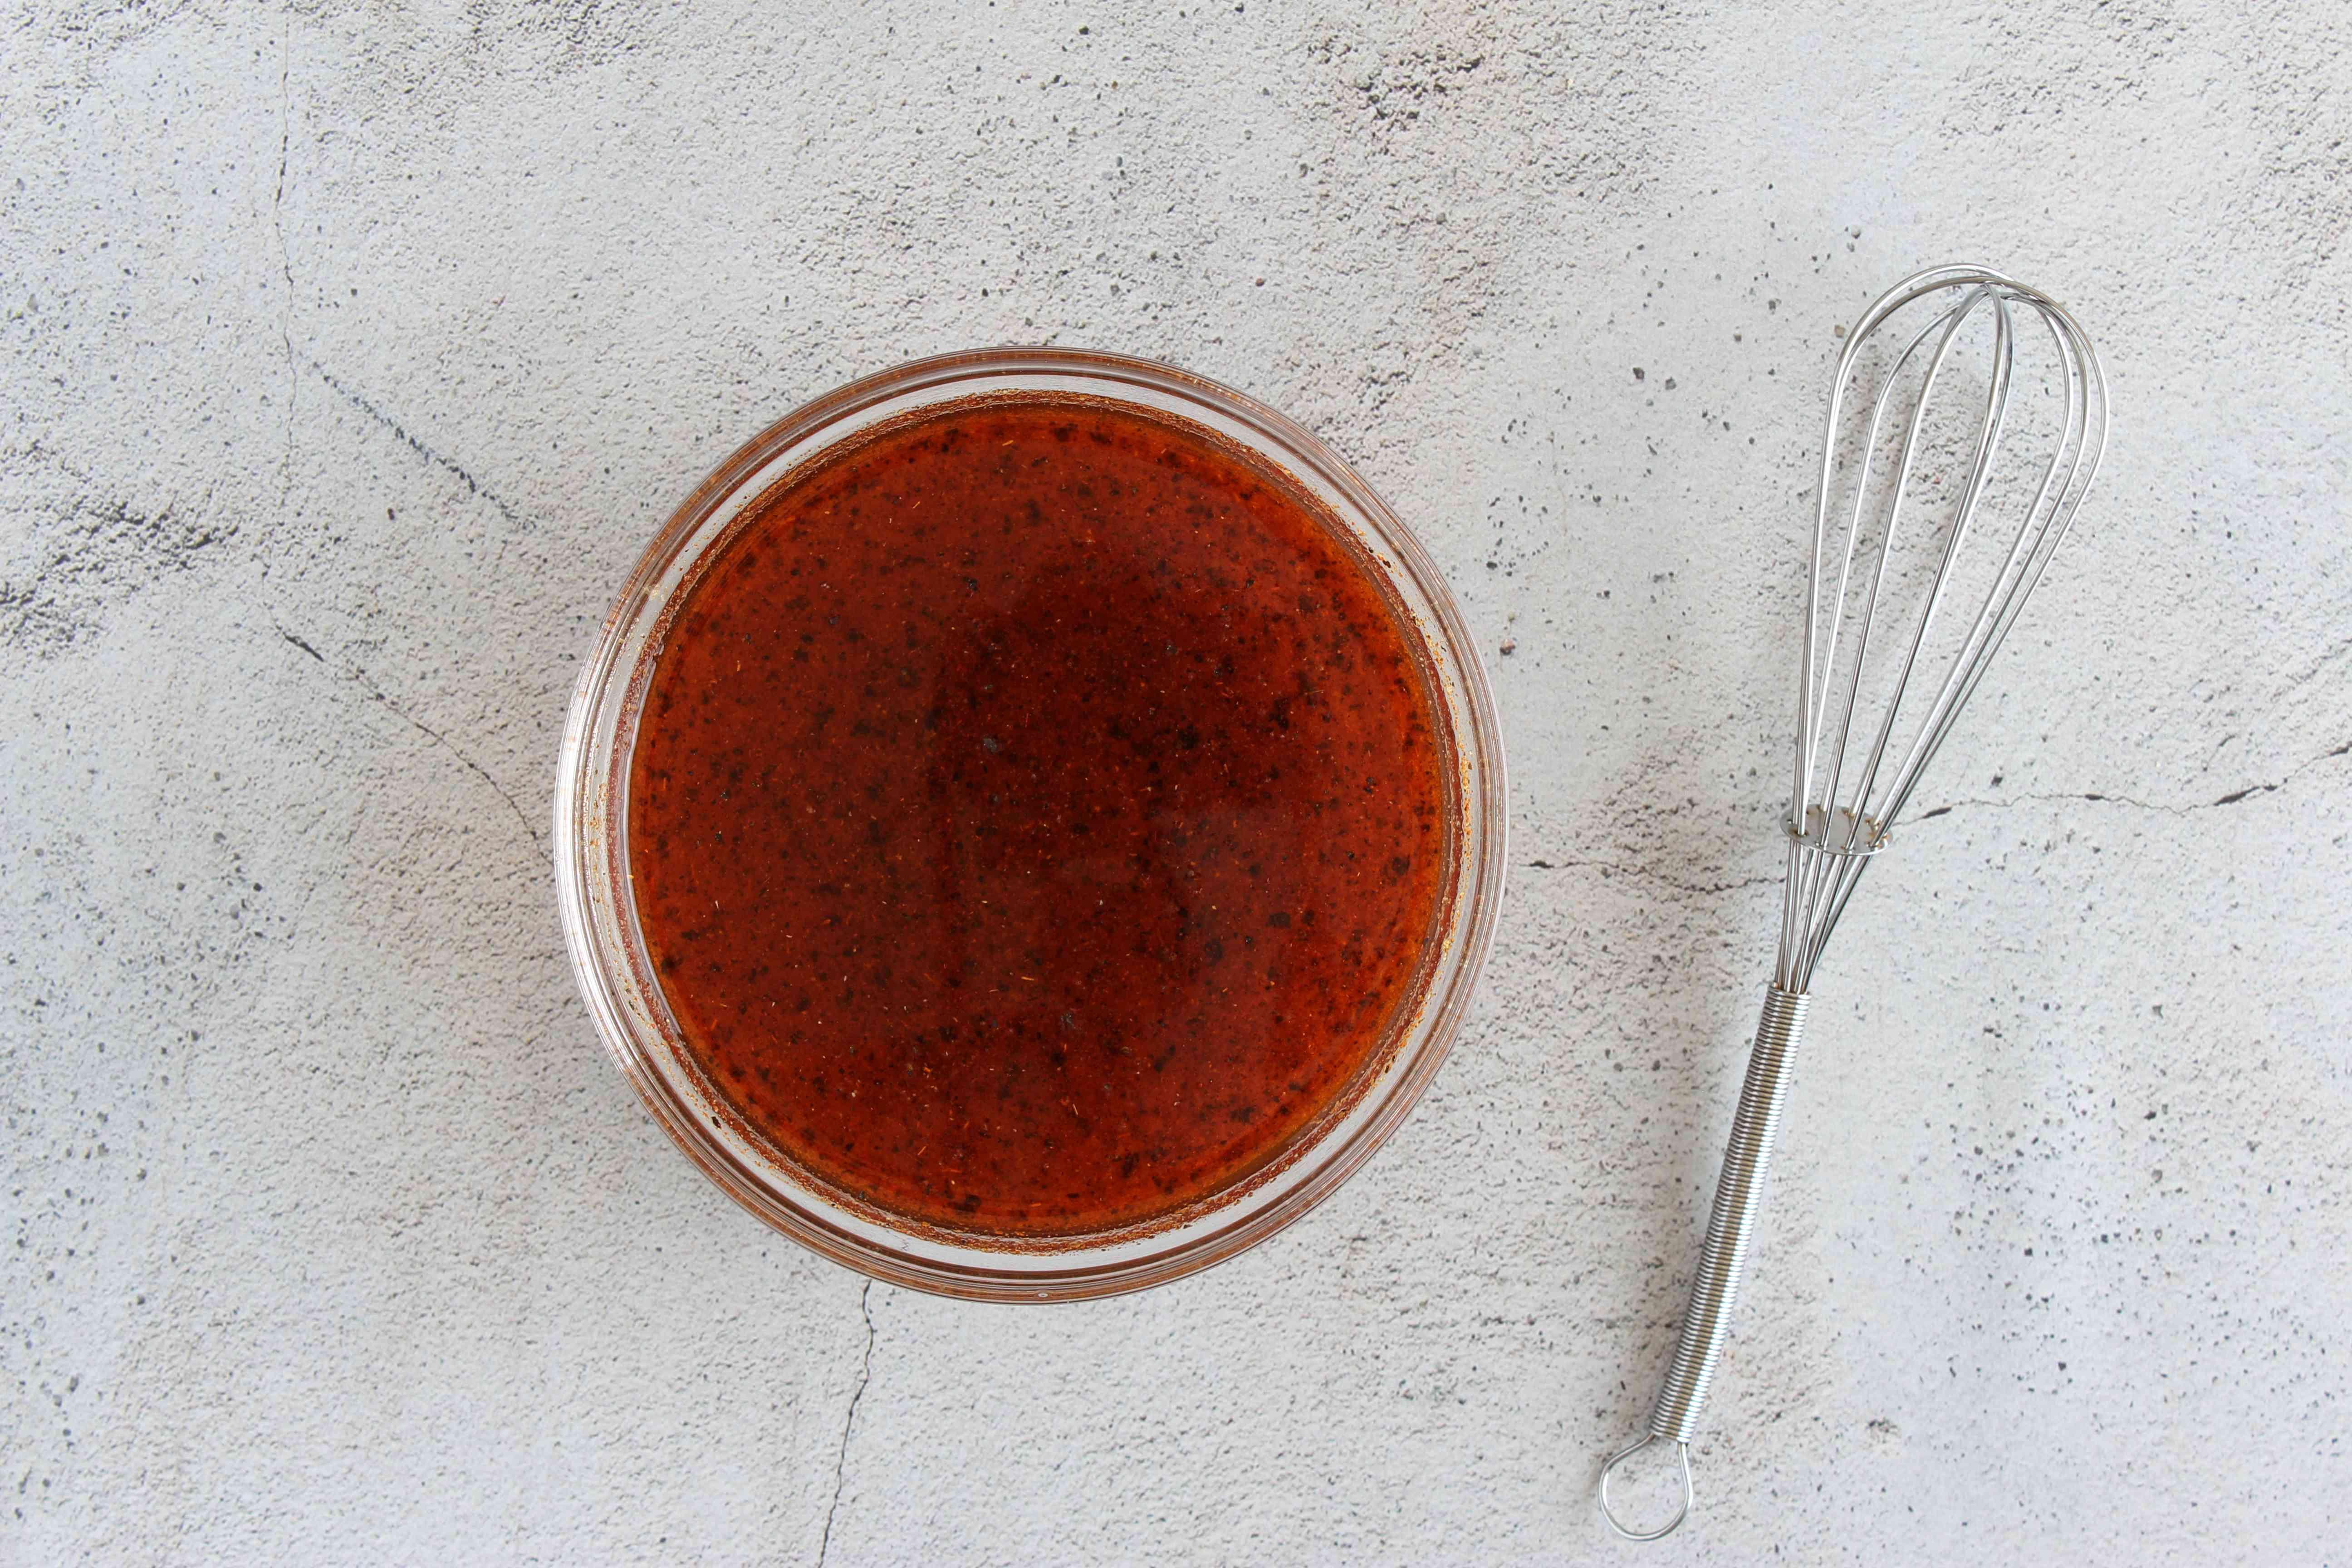 Marinade for salt and vinegar wings